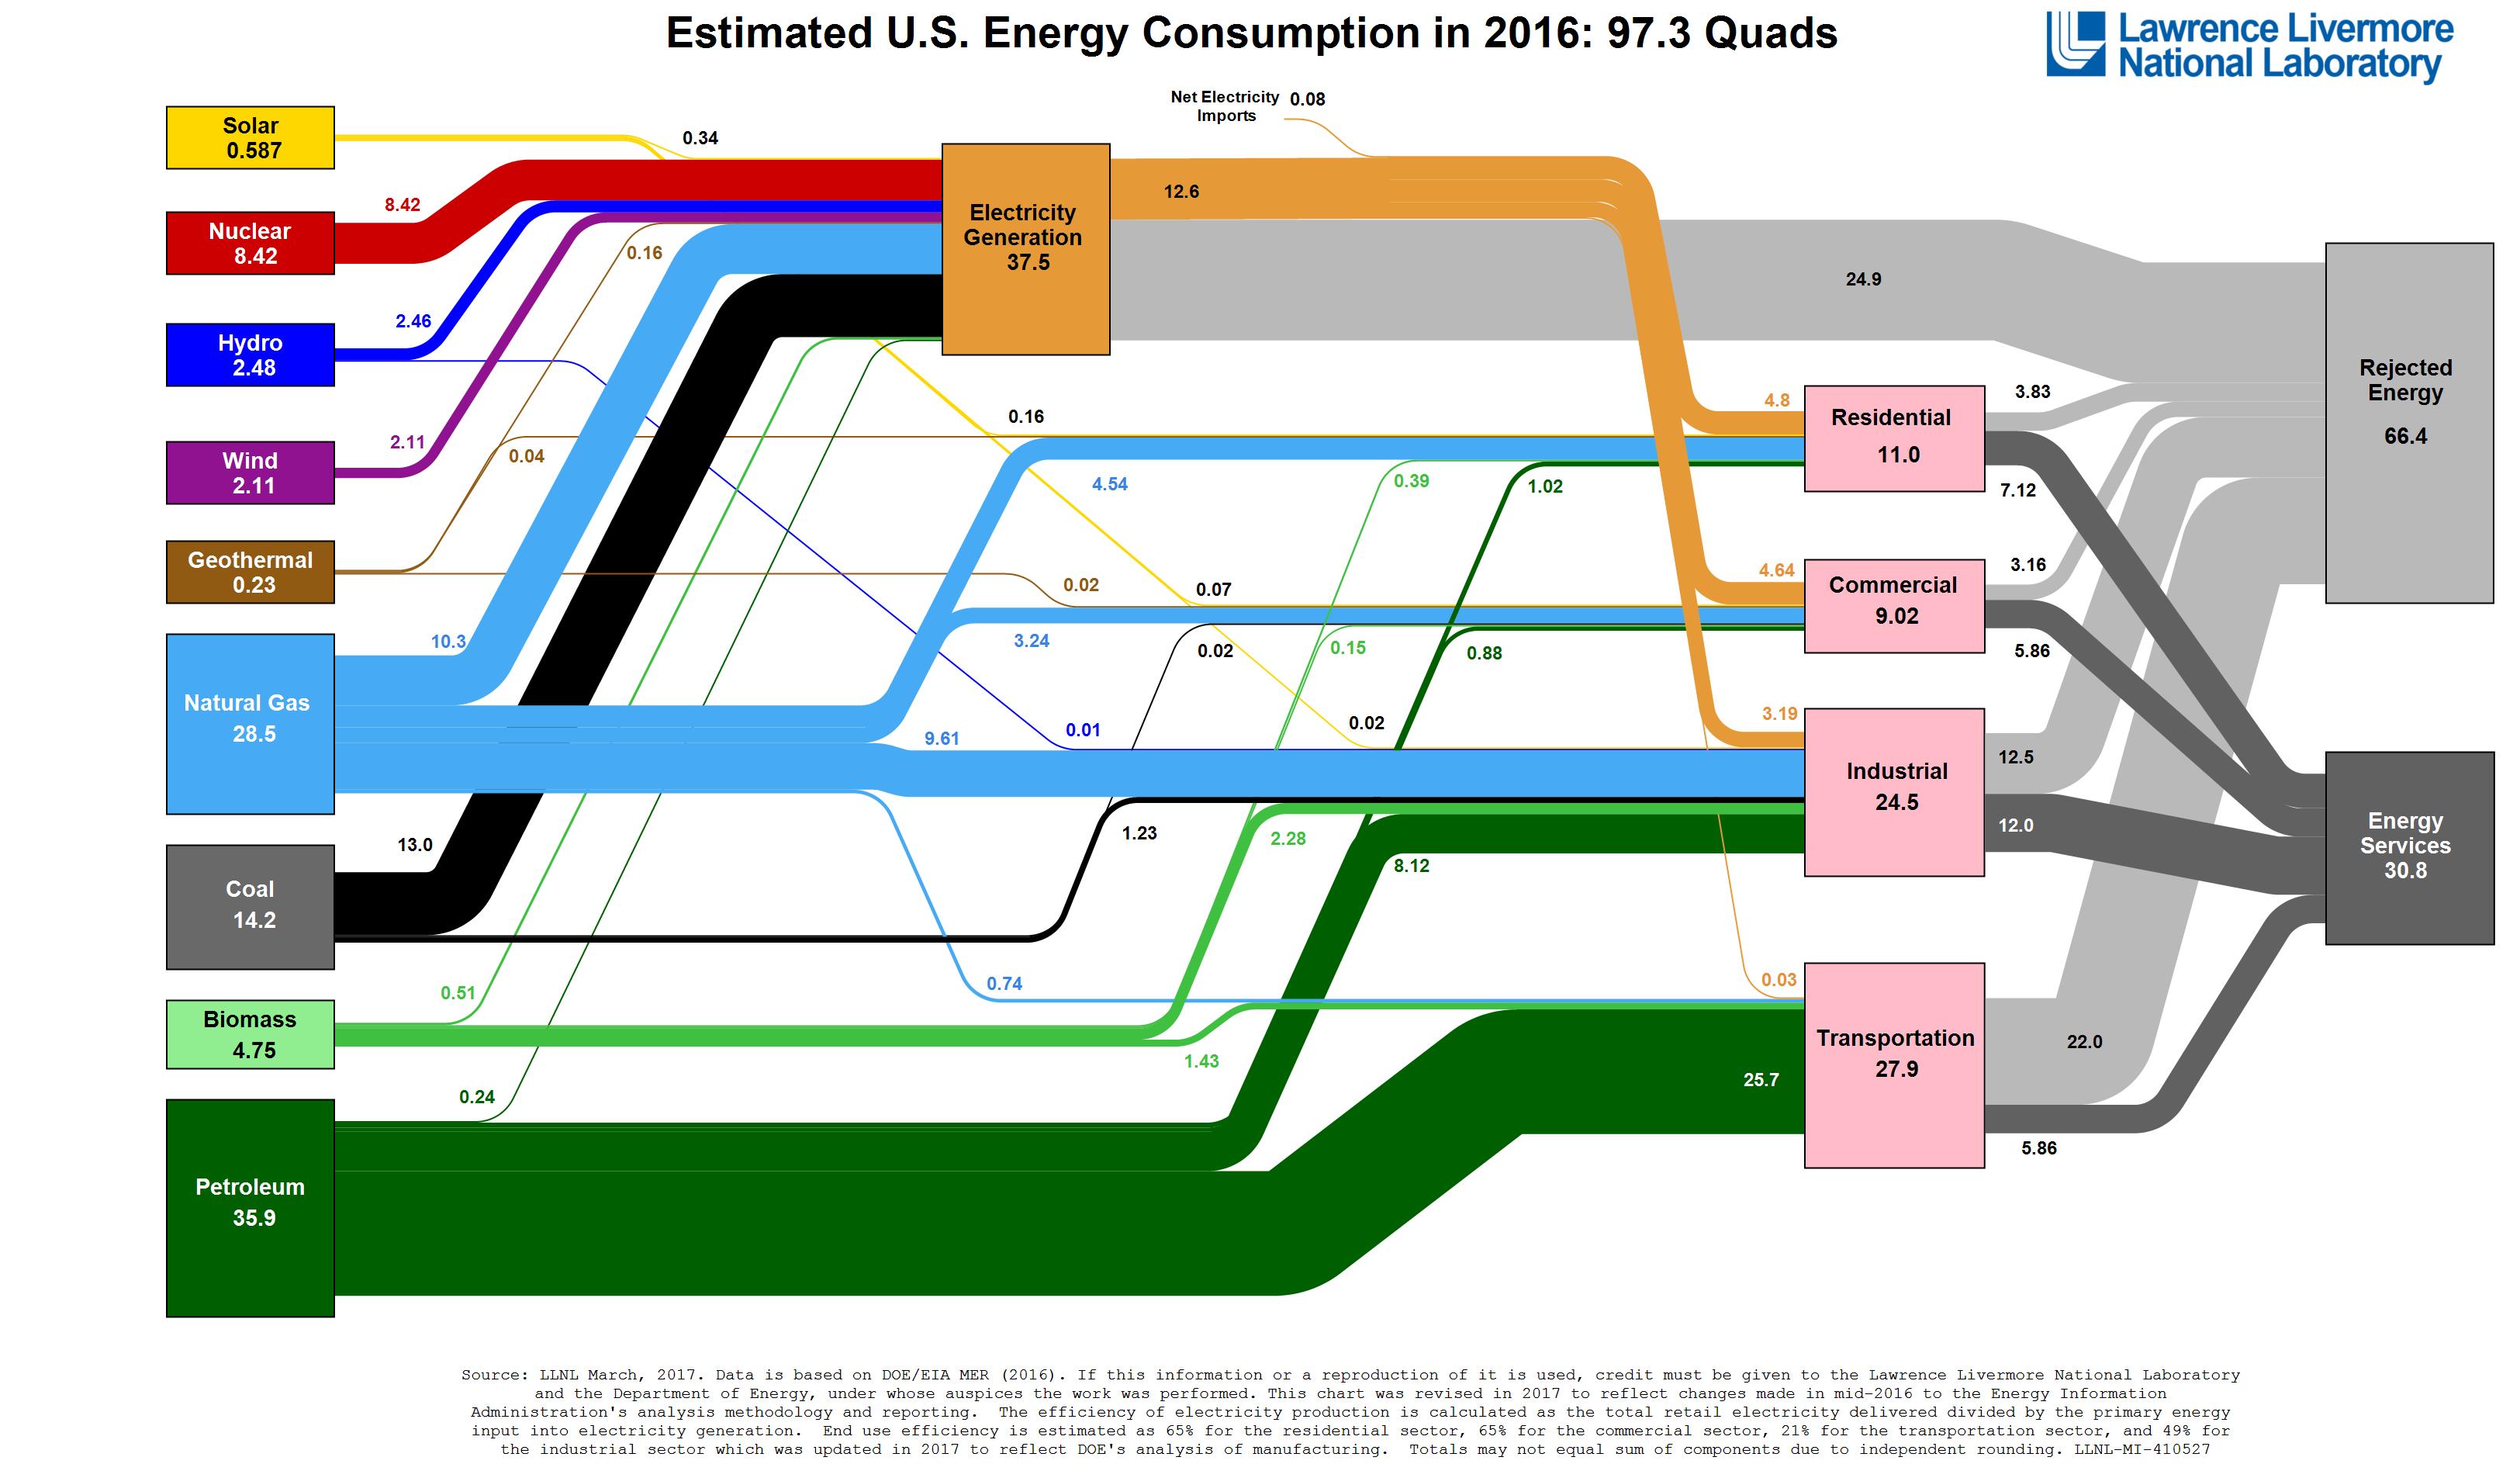 Sankey Diagramm Energiefluss USA 2016 Energiebedarf Abwärme Energieverluste Wandlungsverluste